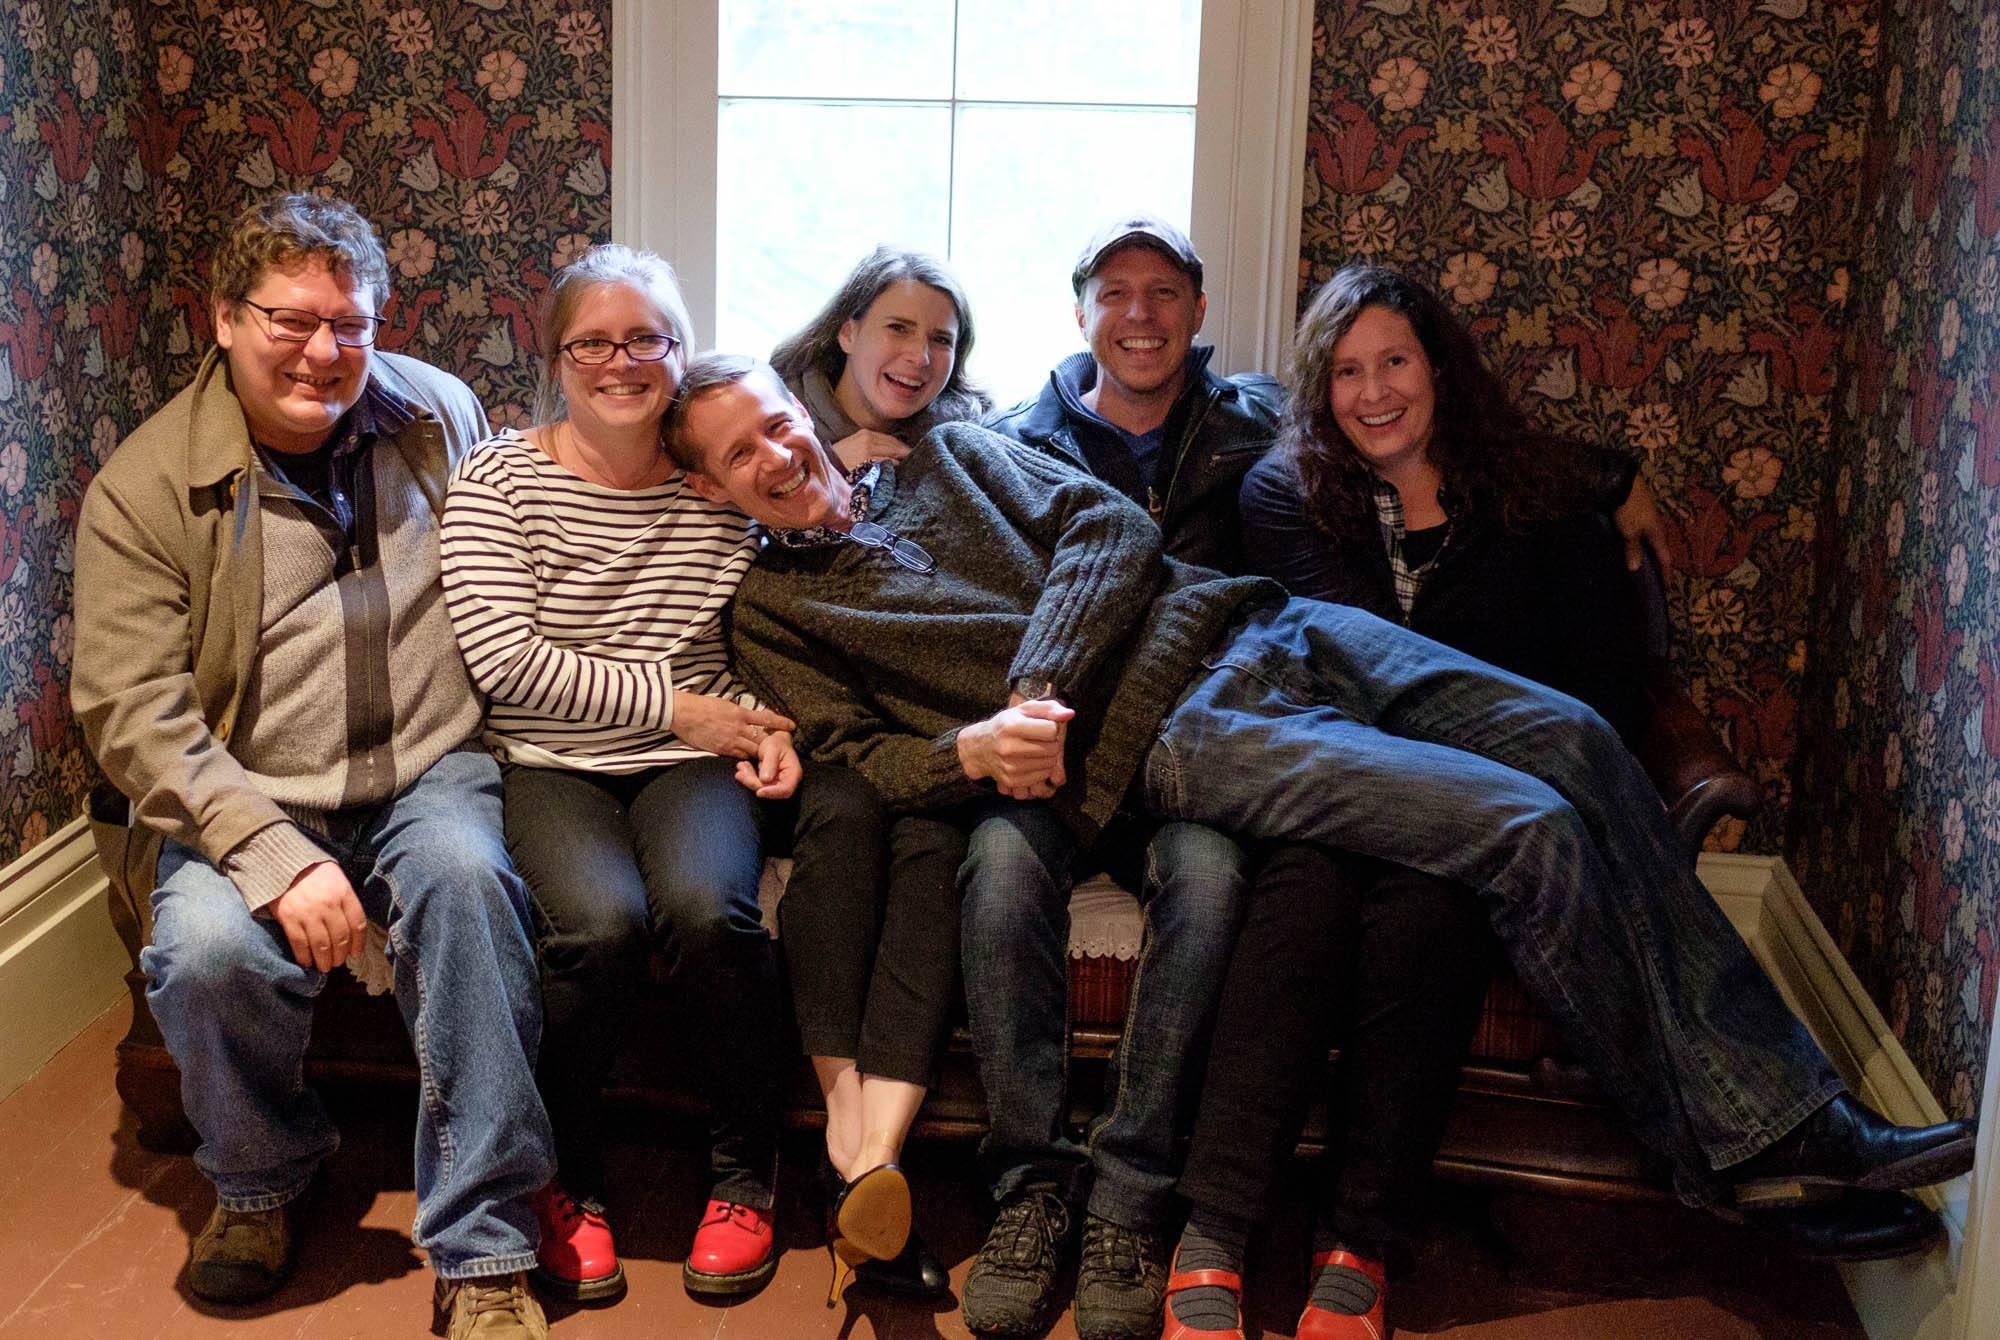 The ilsa team, all smiles at Pauline Johnson's house, chiefswood: Jesse archibald-barber, aubrey hanson, adar charlton, sam mckegney, pauline wakeham, and warren cariou